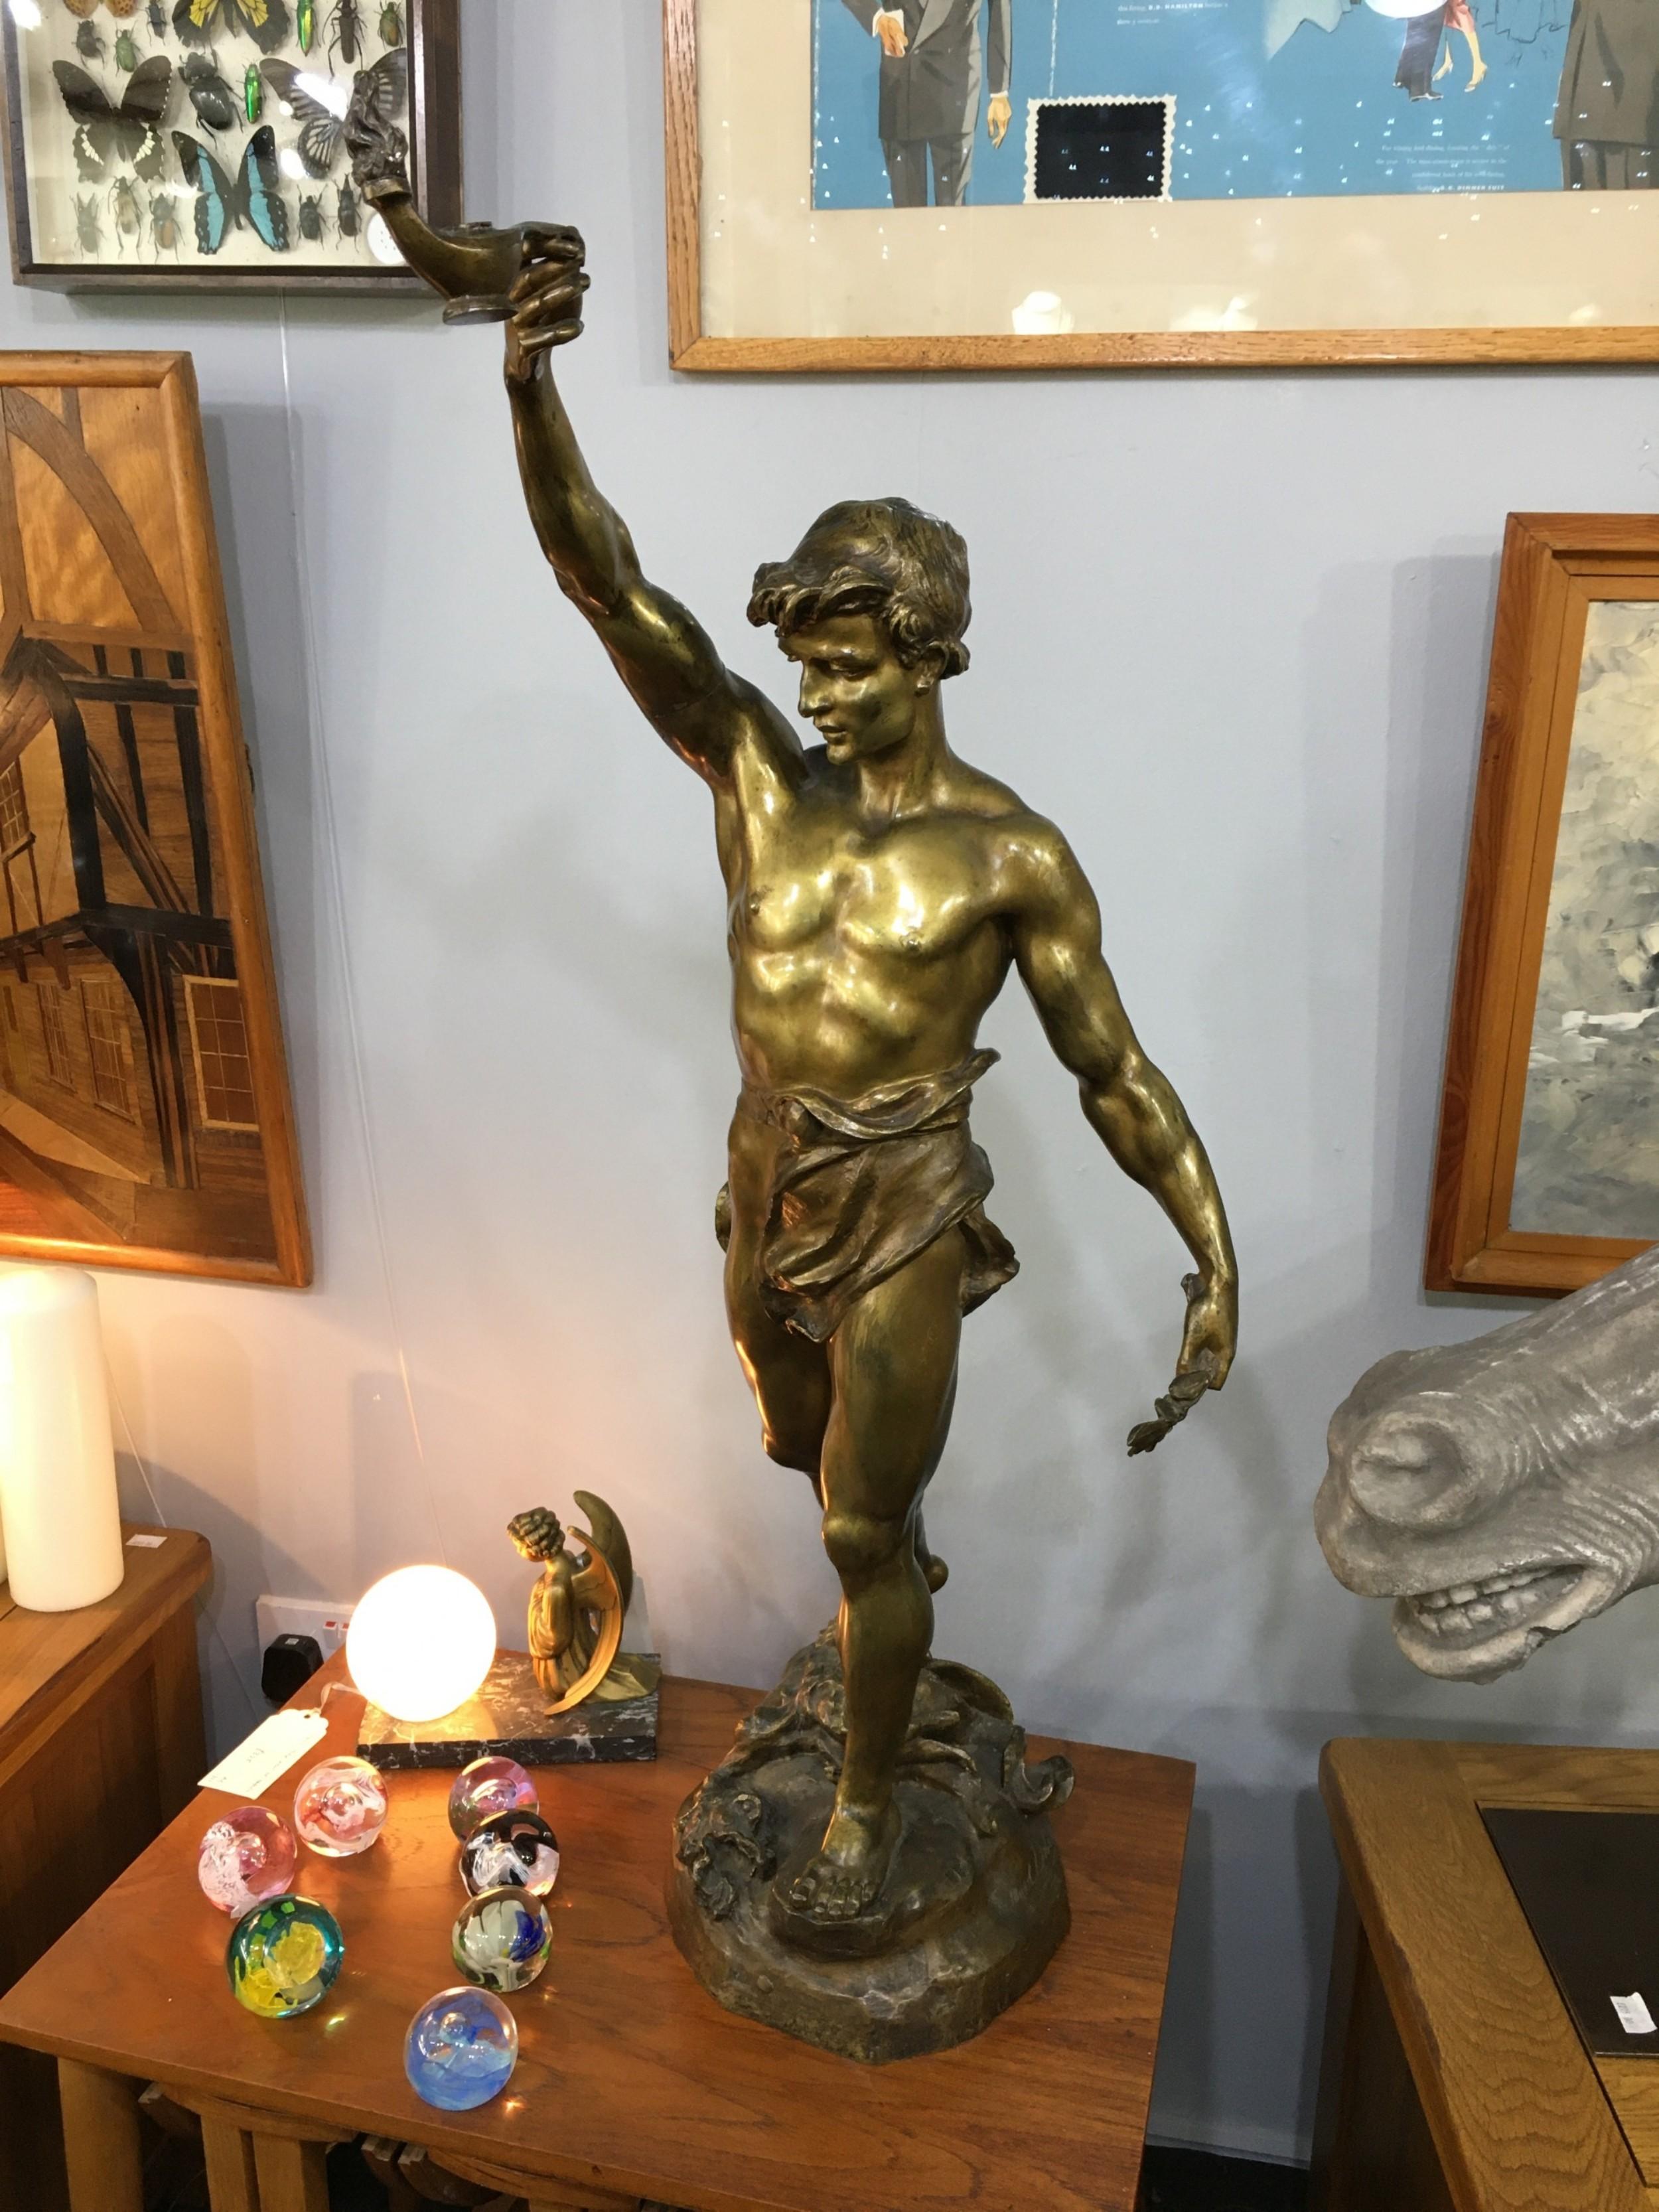 marcel debut 'wisdom' an original cast wax c19th bronze with inscription